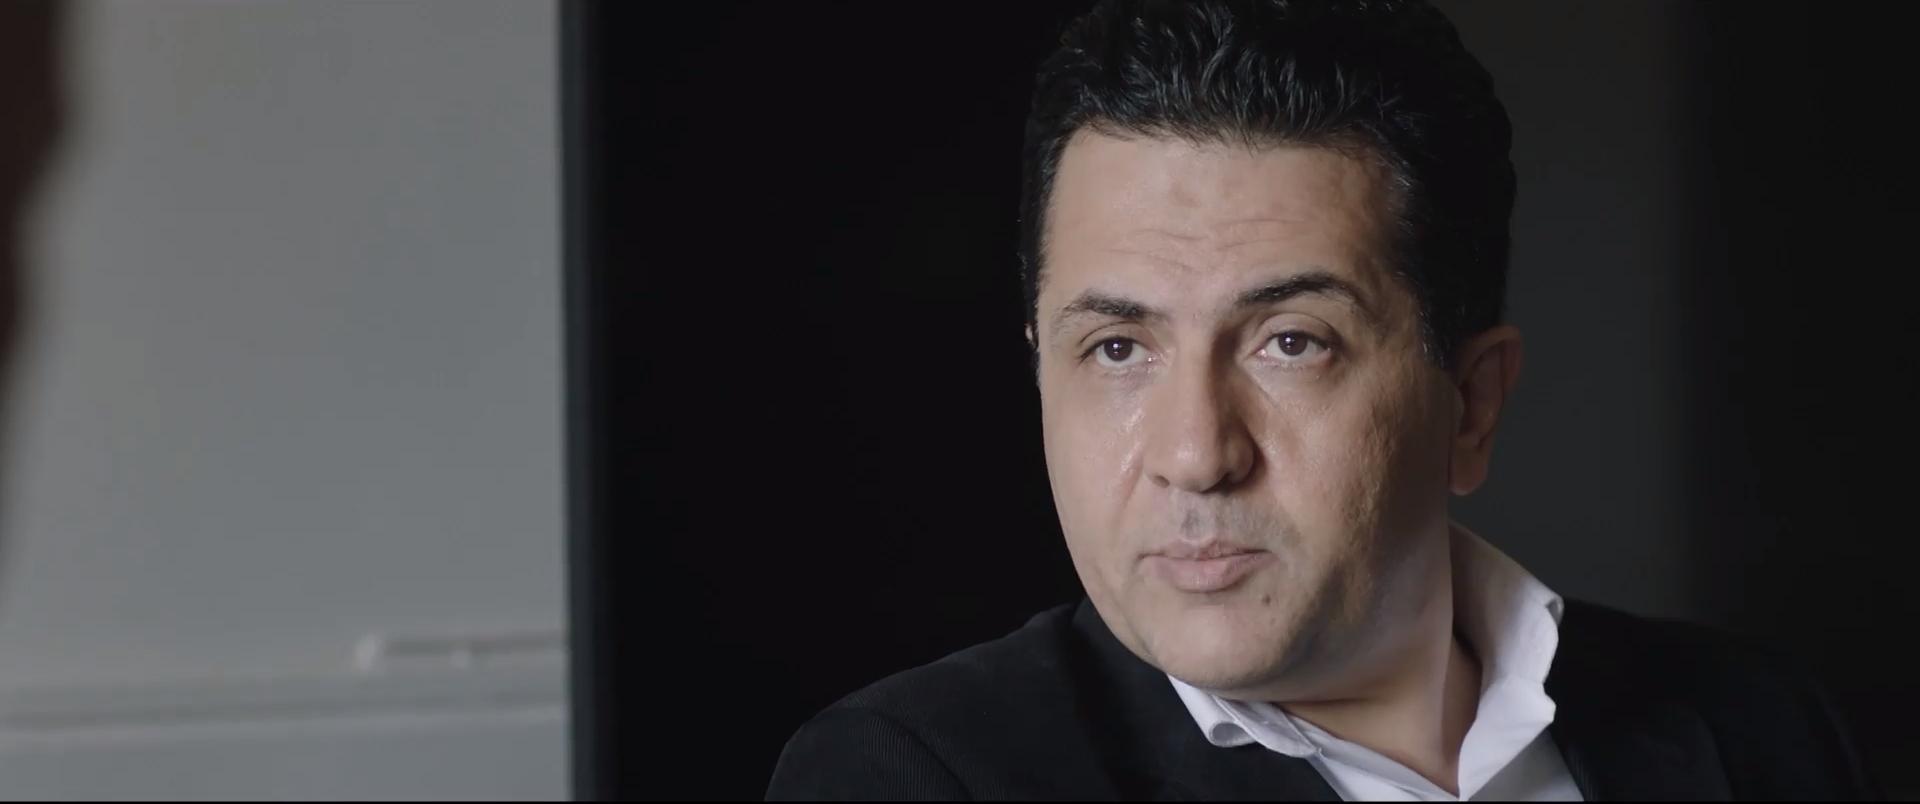 احمد رفعت فى دور الضابط جاد